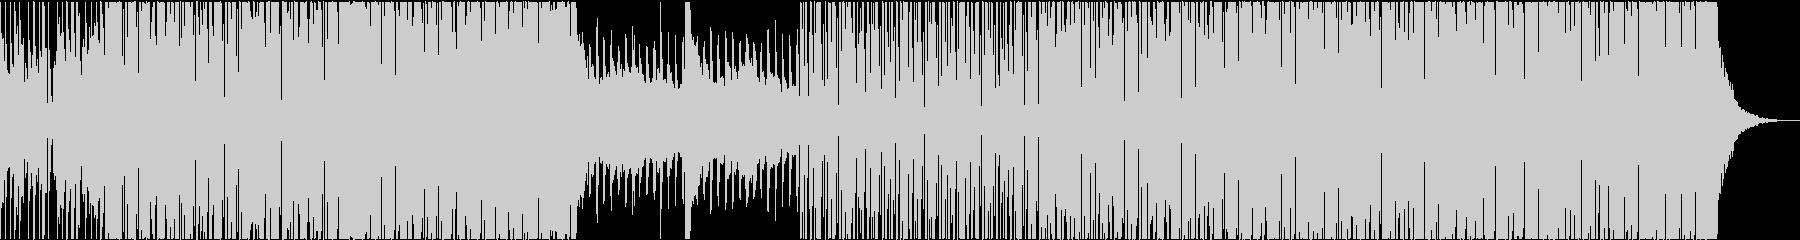 EDM ピアノ ネガティブ ダーク 混沌の未再生の波形